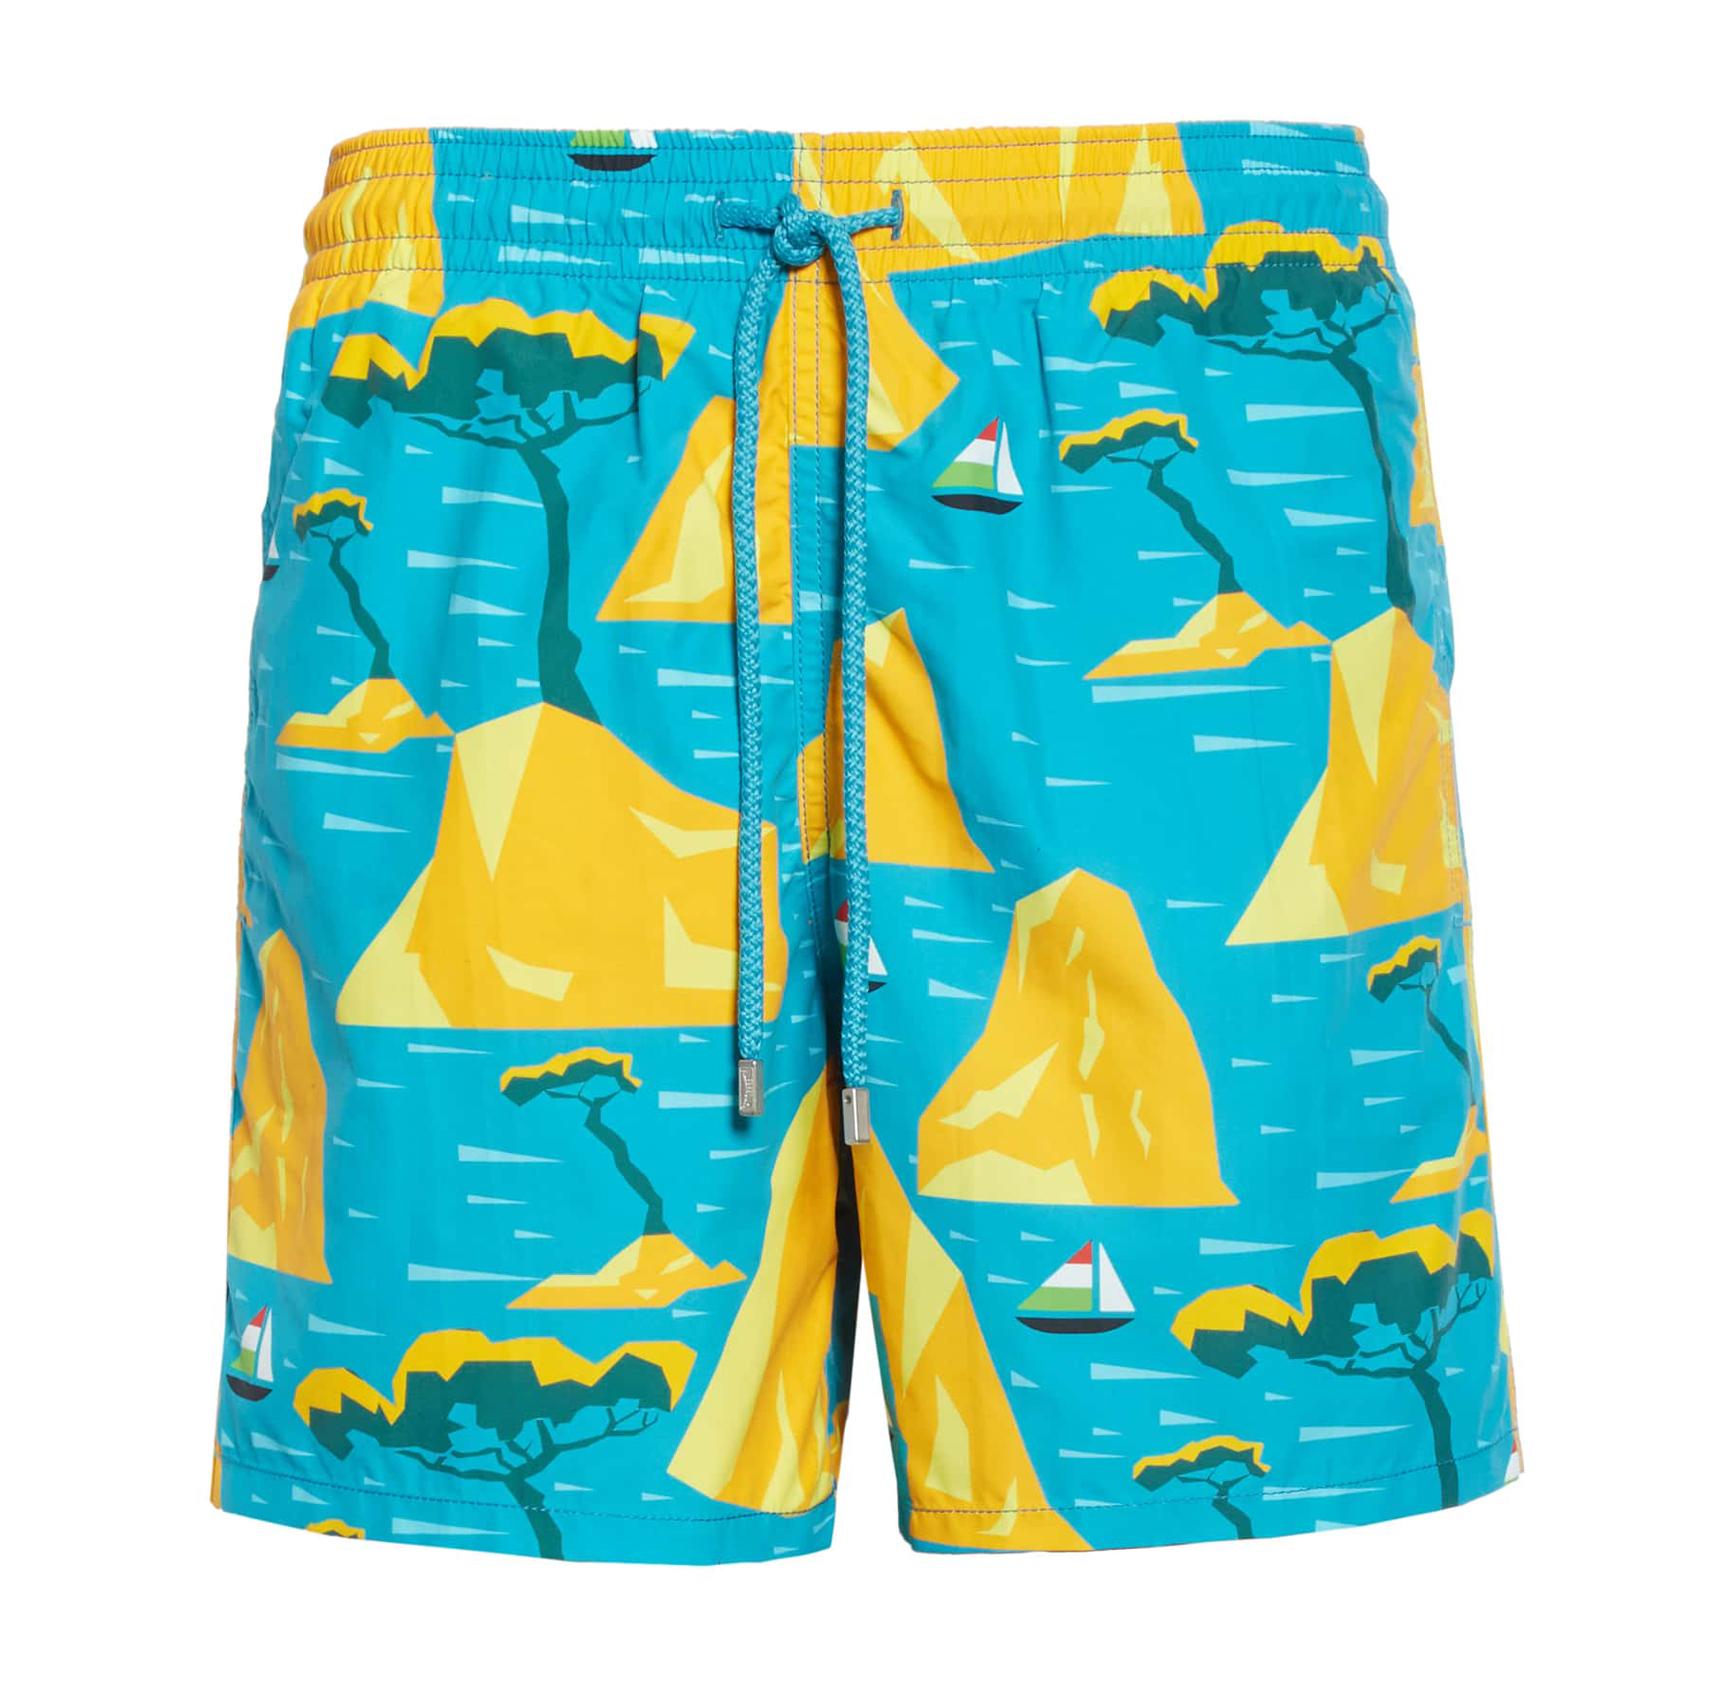 Island Swim Trunks